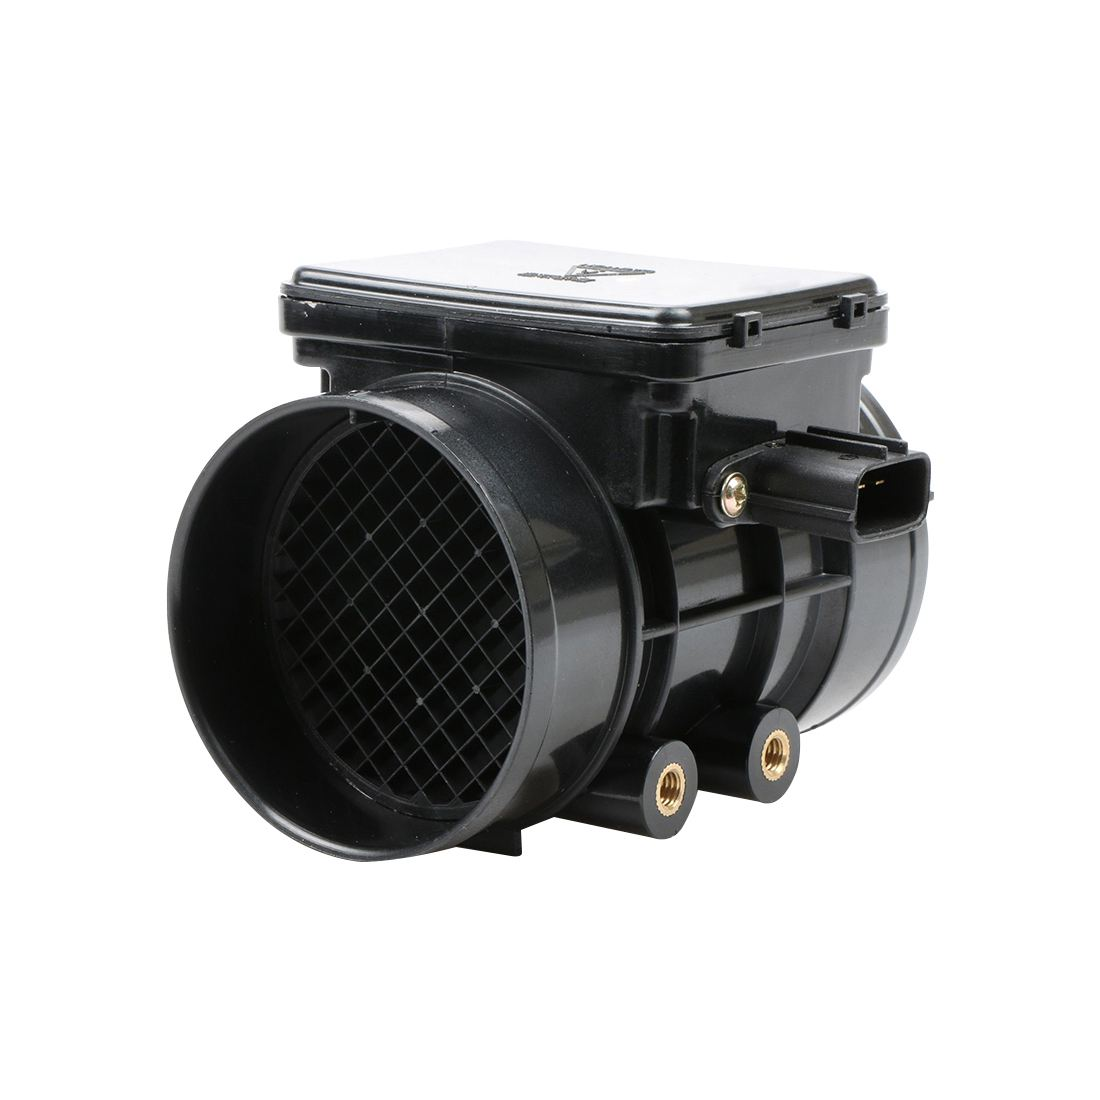 Mass Air Flow Sensor Meter MAF for Mazda Chevy Tracker Suzuki Vitara E5T52071